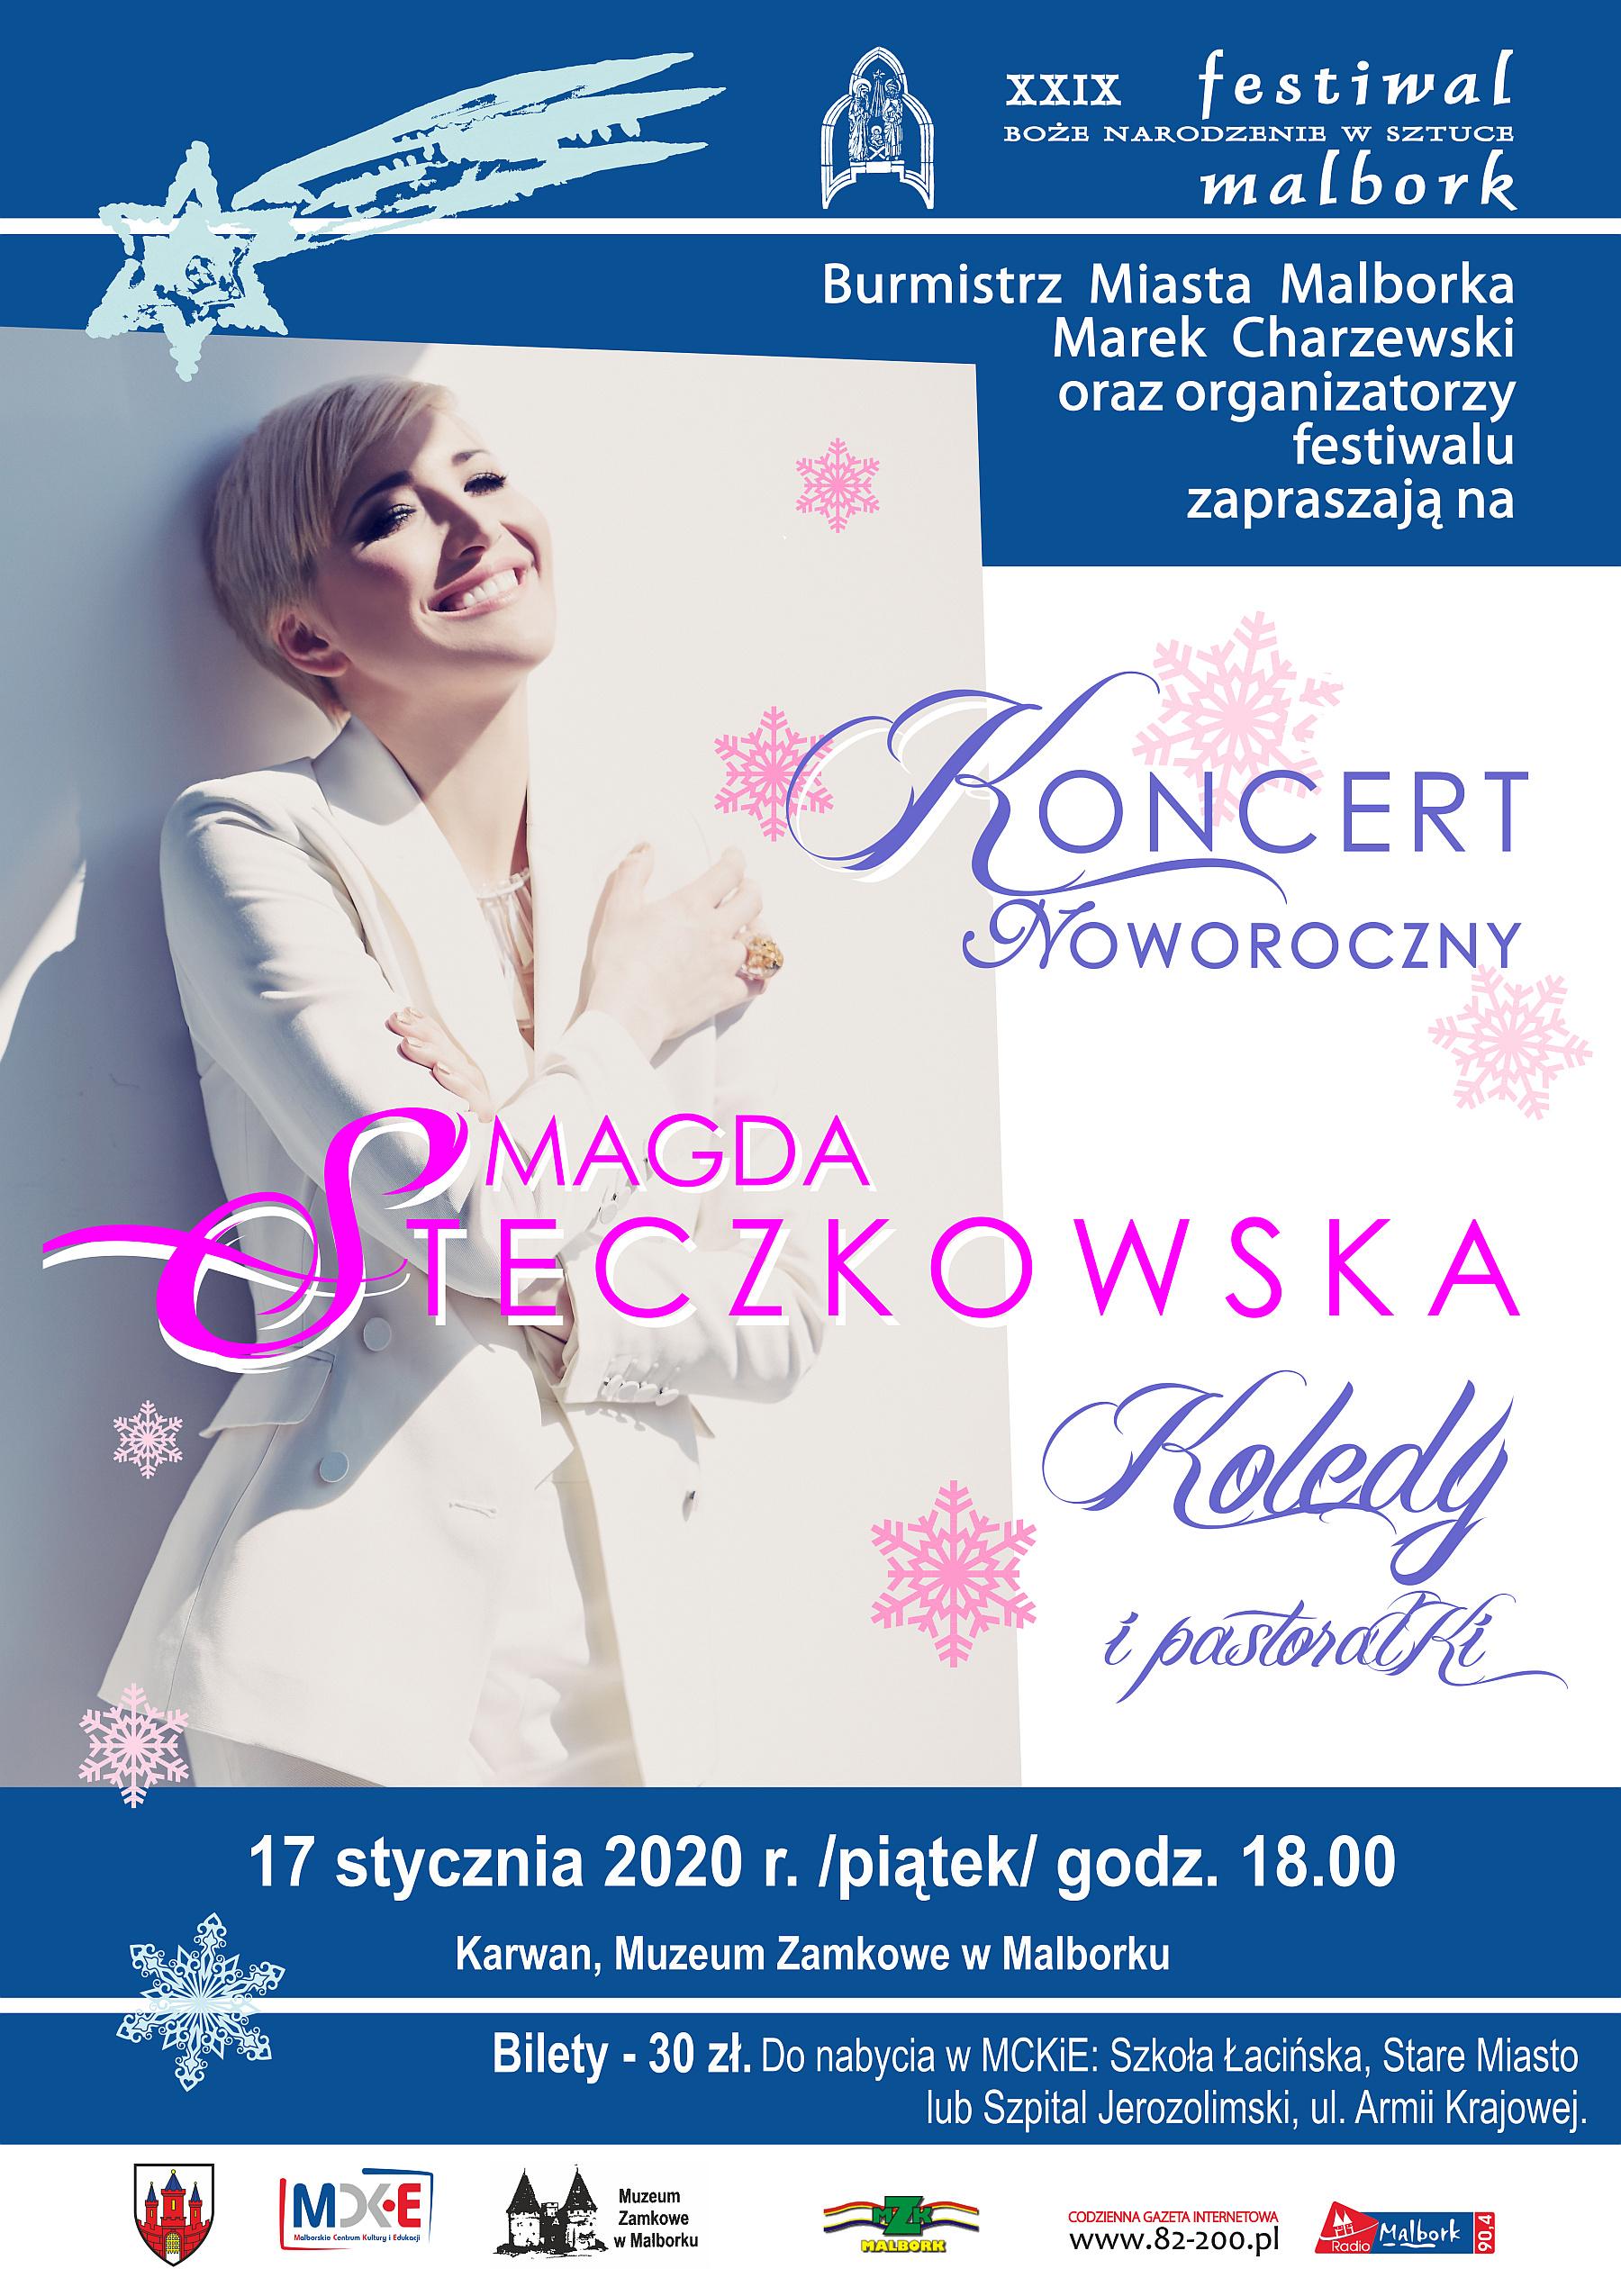 http://m.82-200.pl/2020/01/orig/koncertsteczkowska-5383.jpg